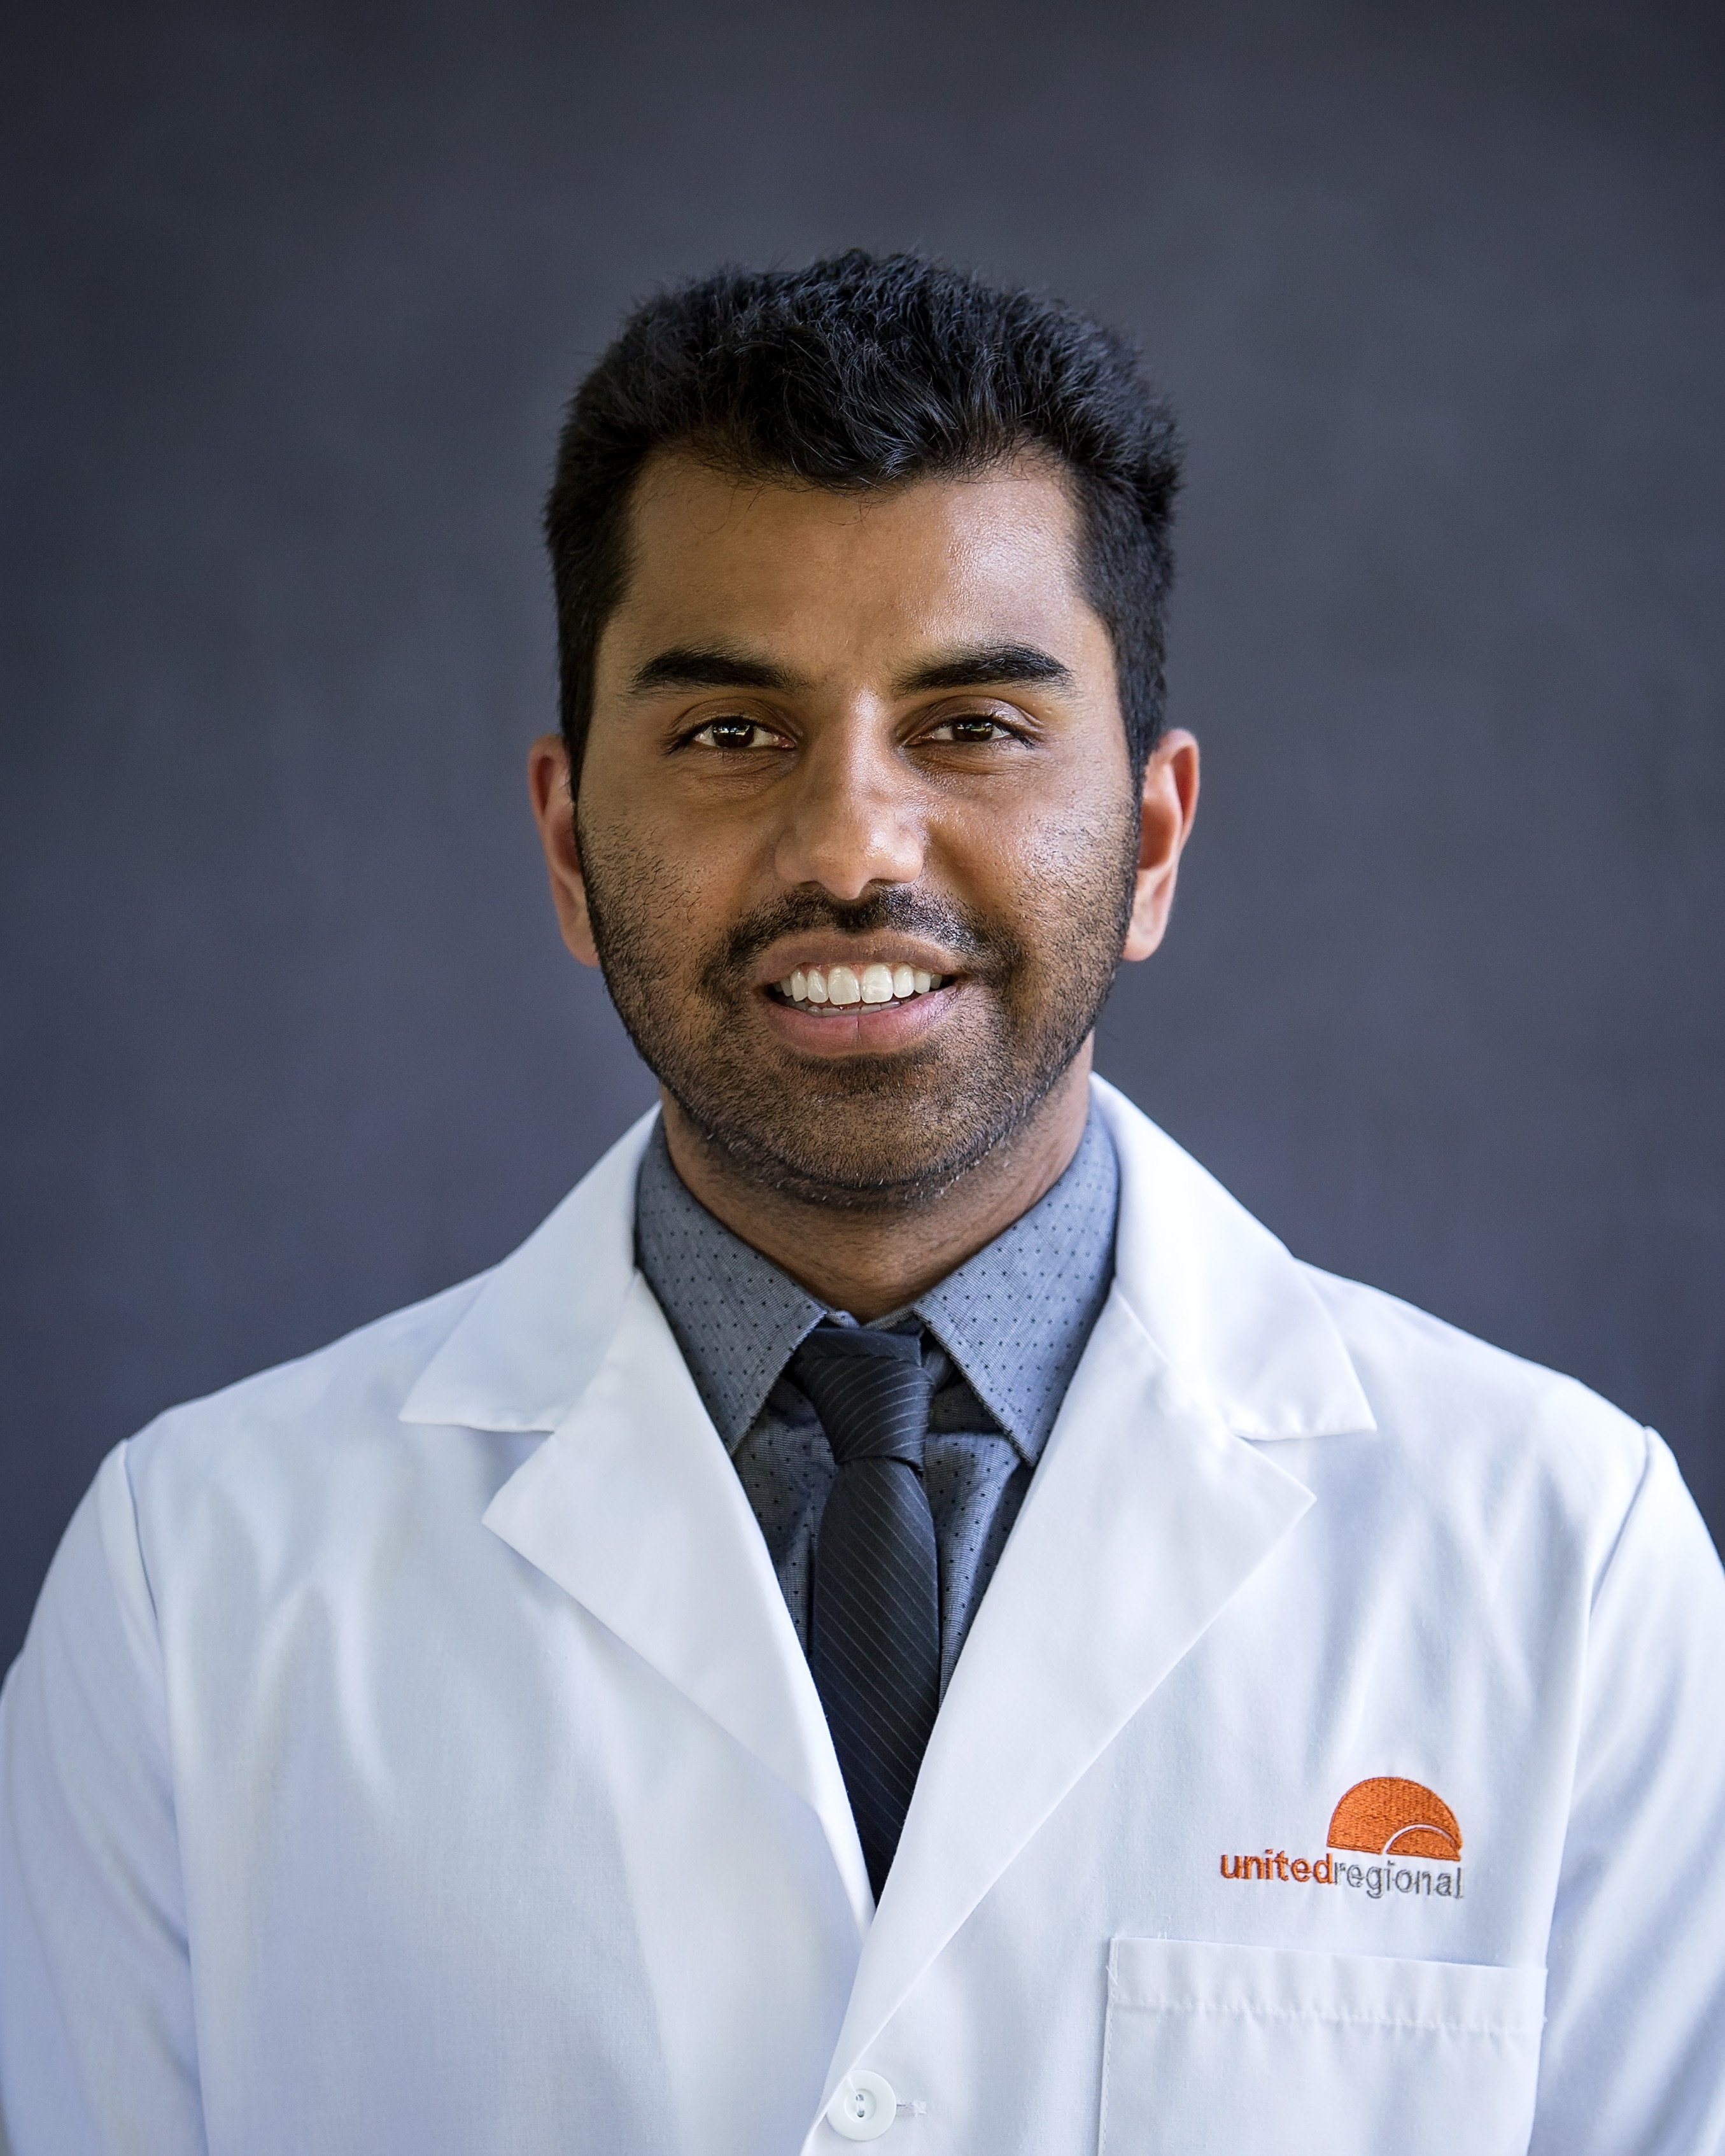 Darpan Kumar - United Regional Health Care System